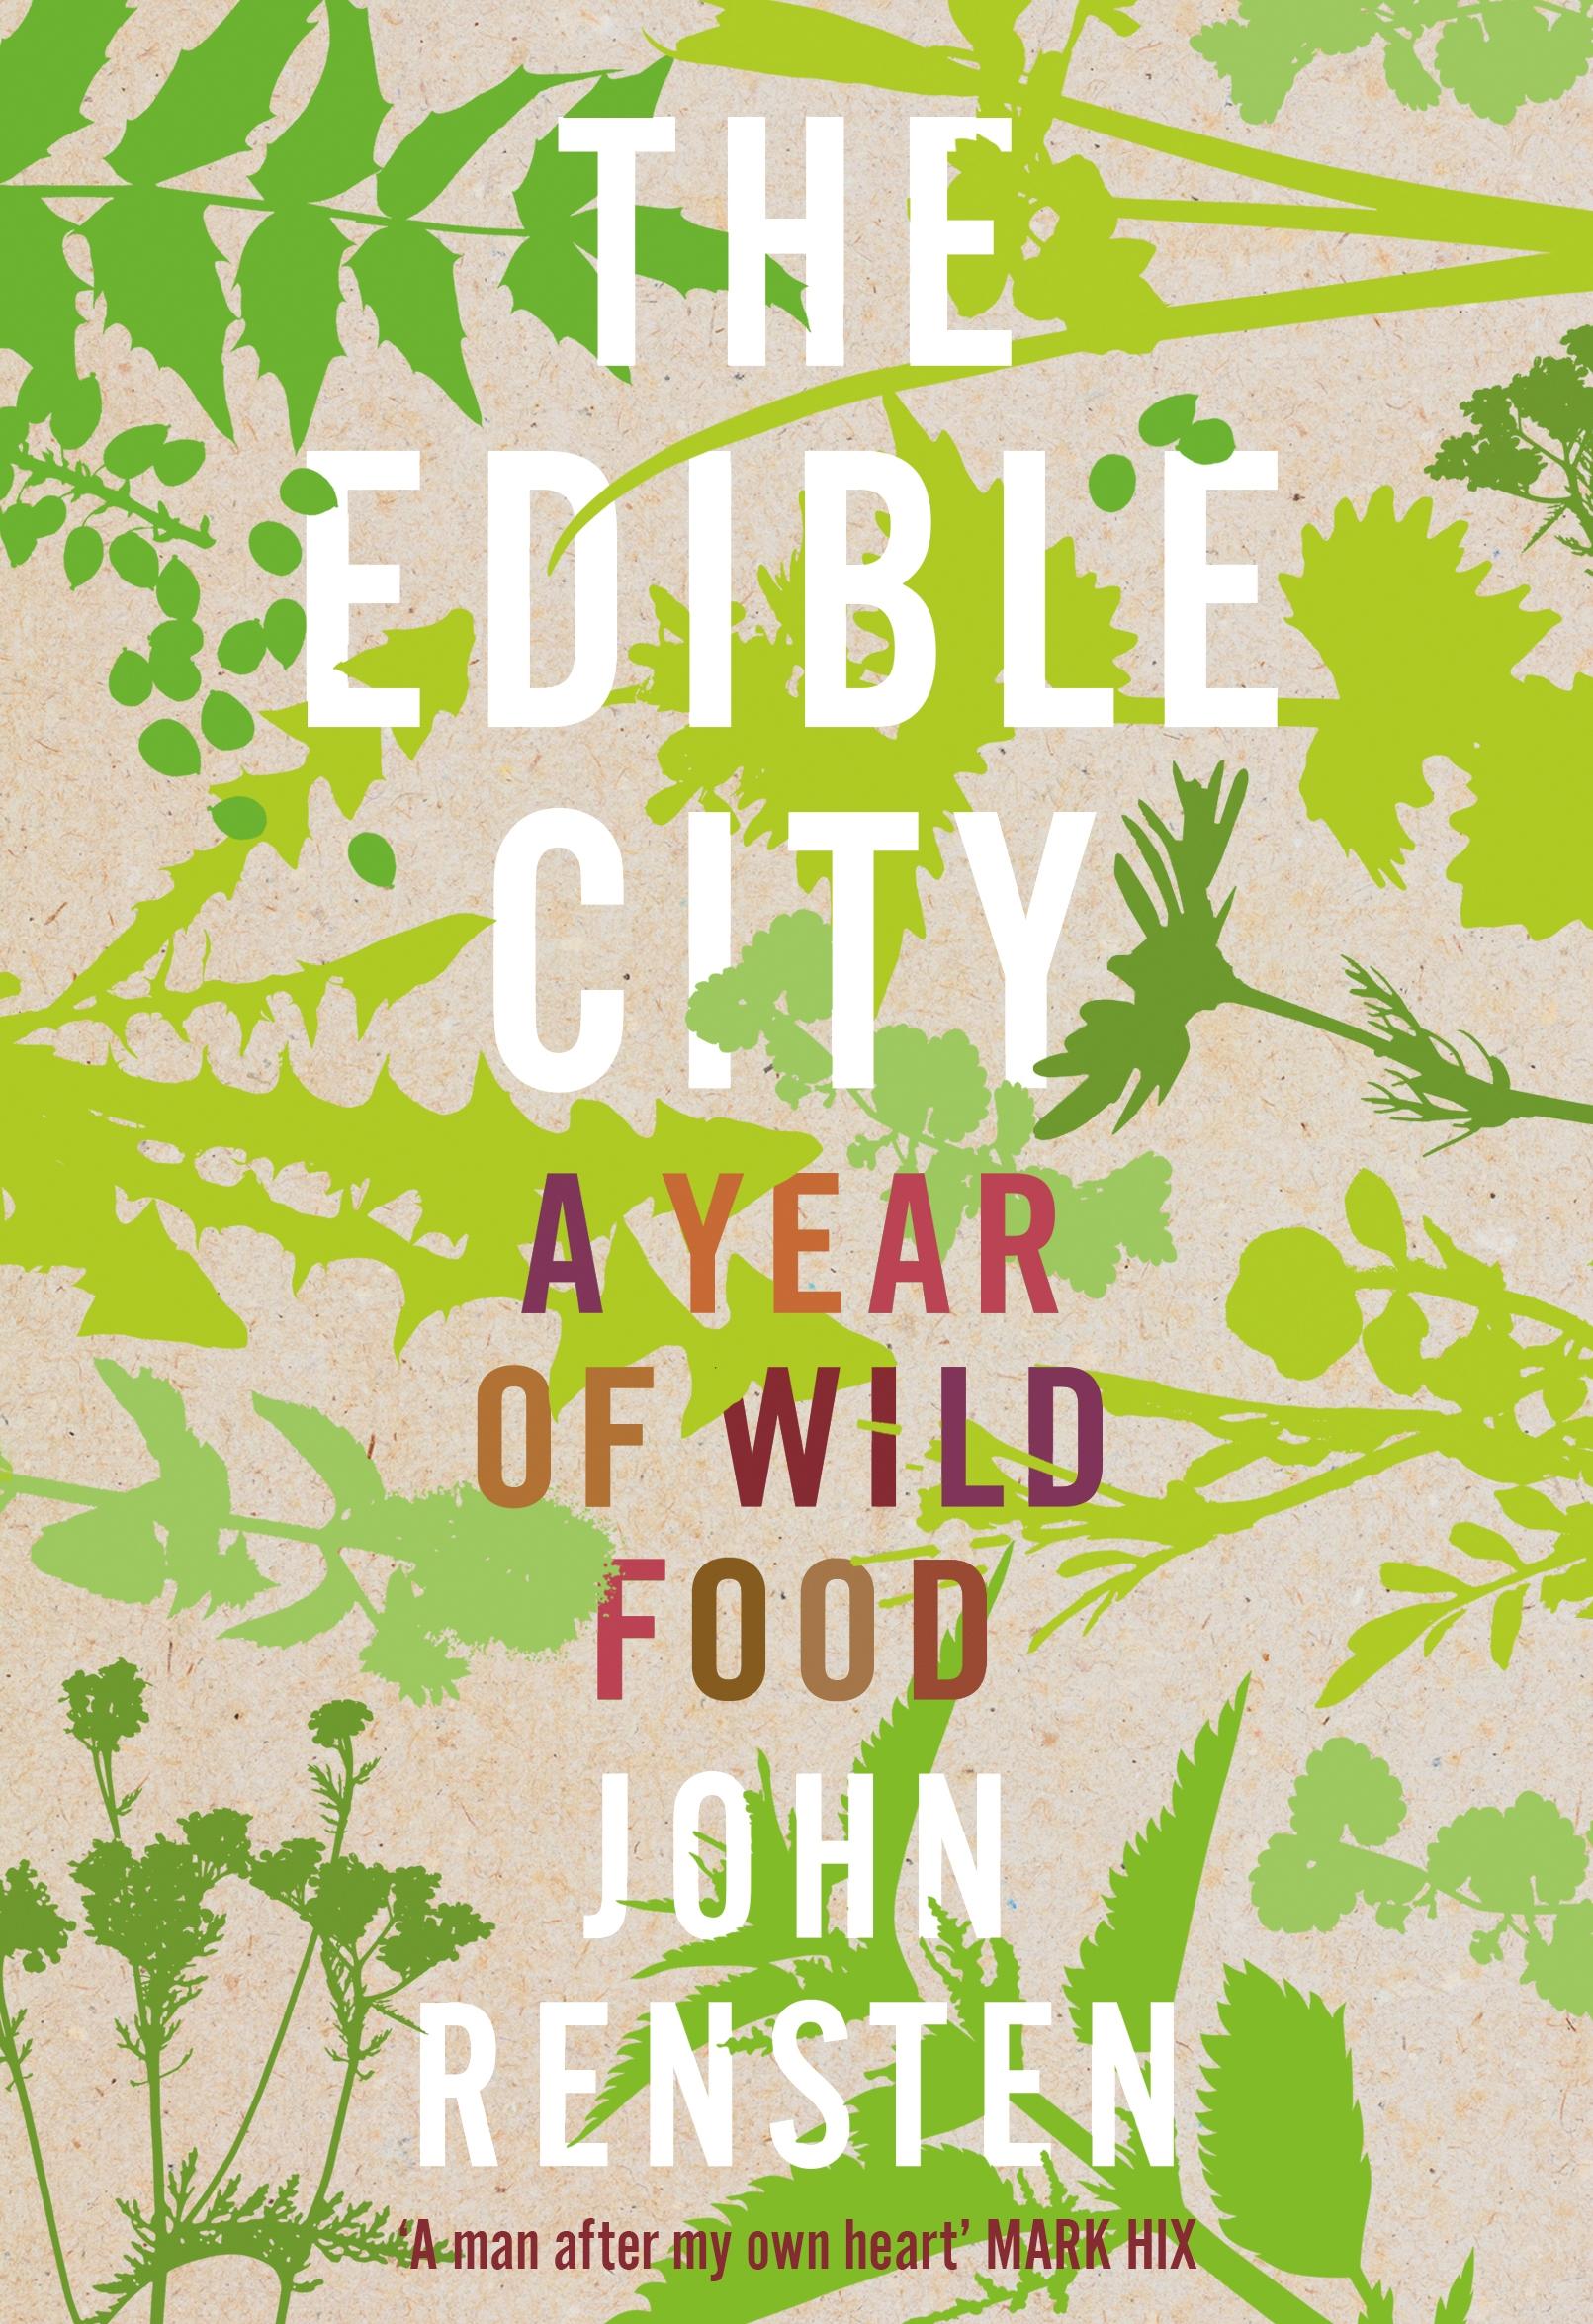 THE EDIBLE CITY    (Boxtree September 2016)